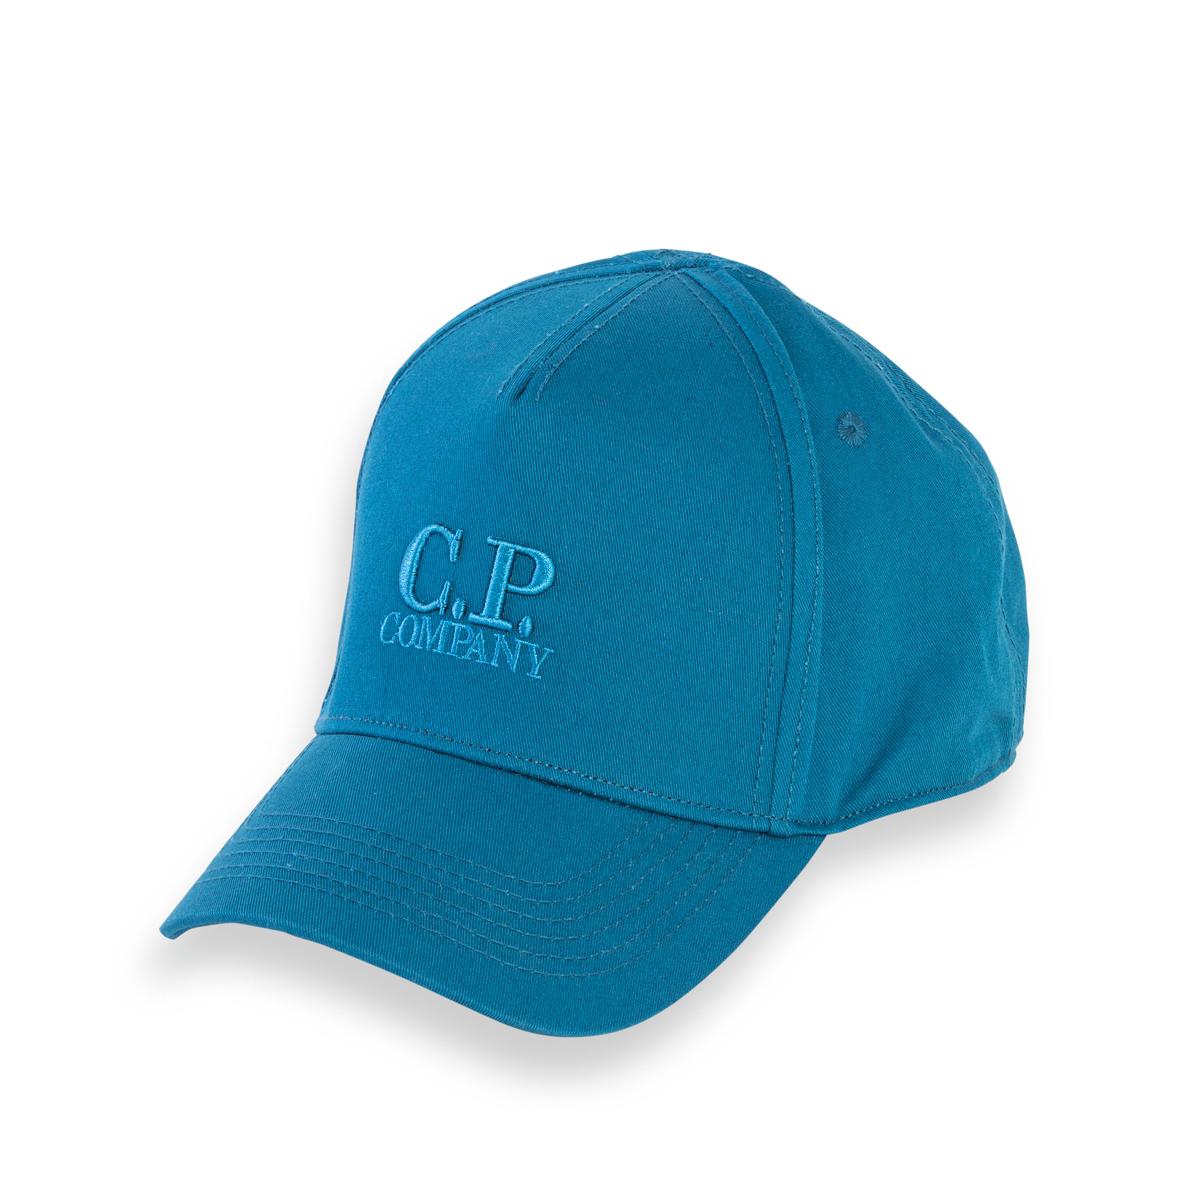 Cappellino C.P. Company Ottanio